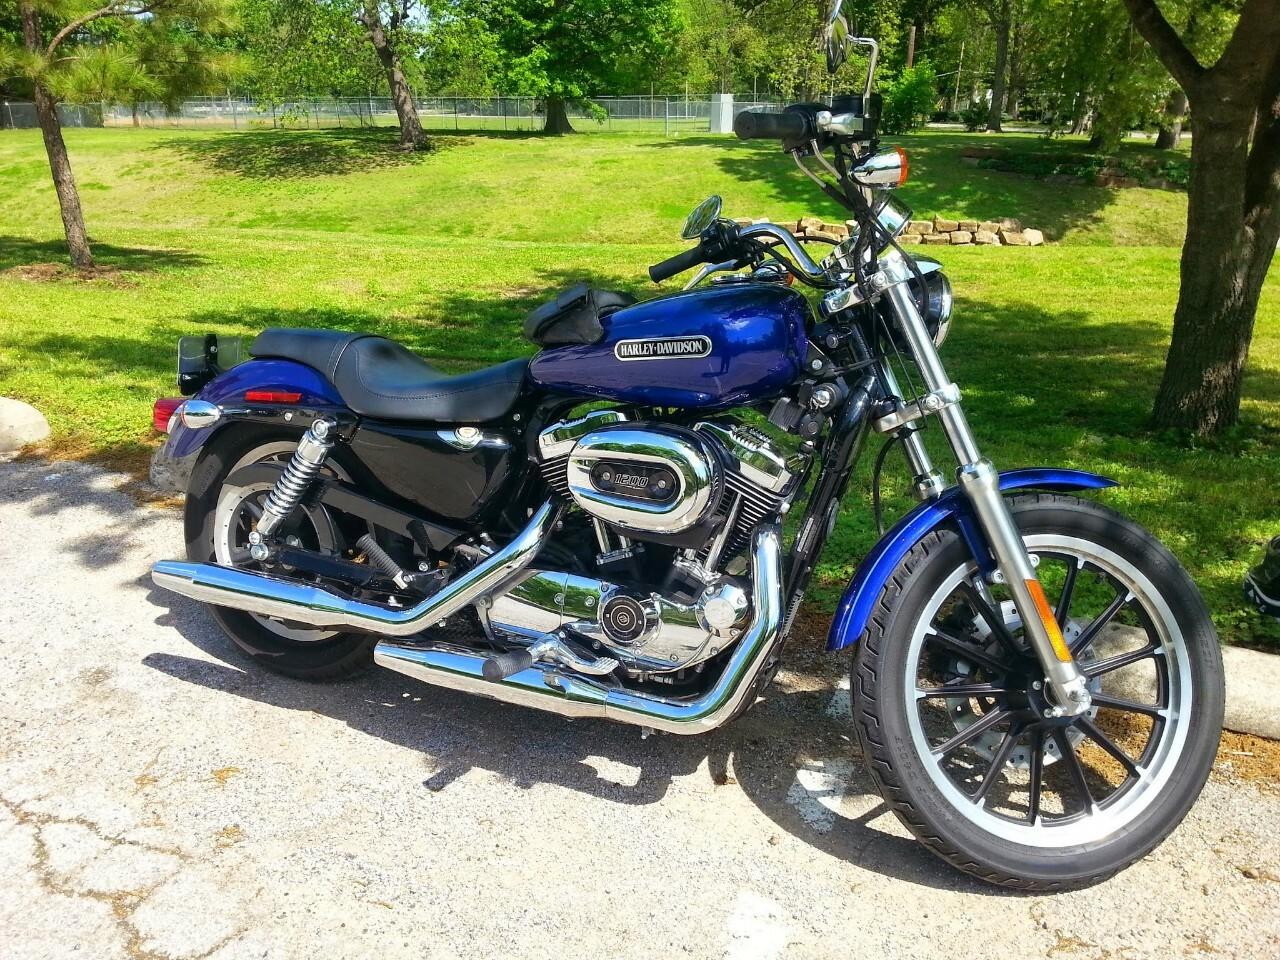 Sportster 1200 For Sale - Harley-Davidson Motorcycles